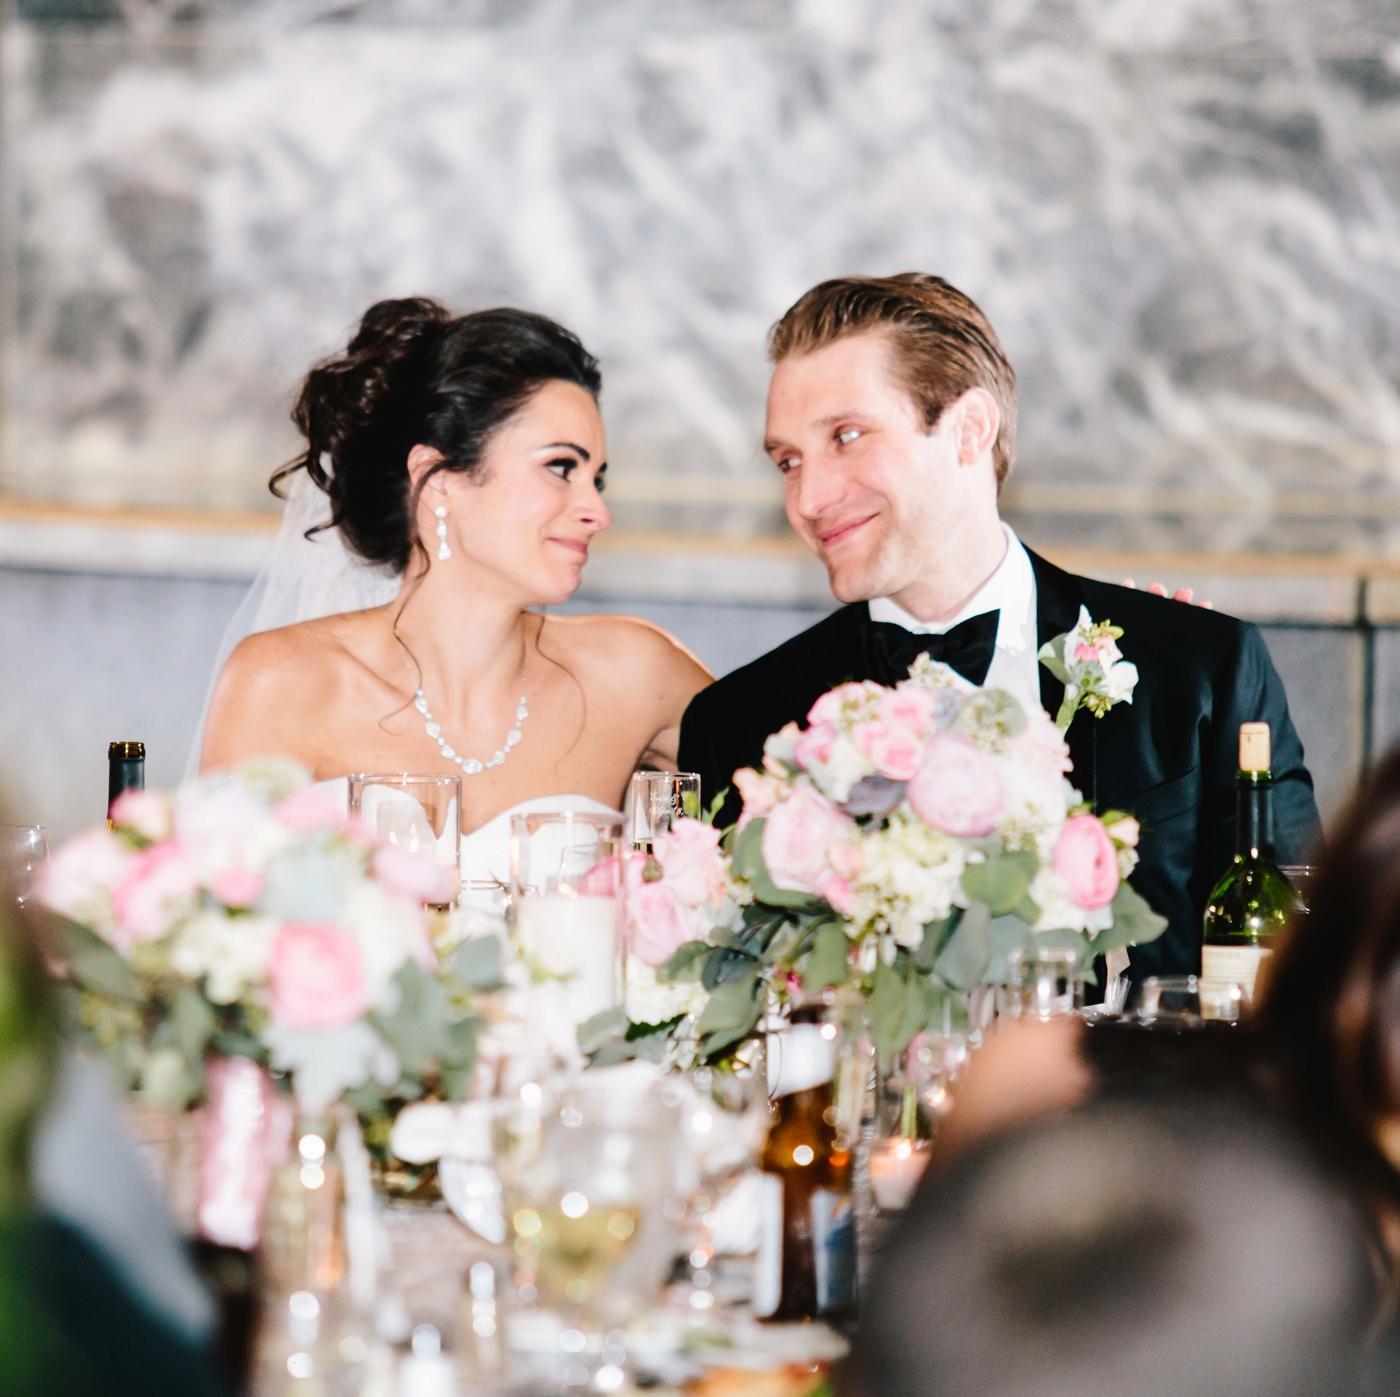 chicago-fine-art-wedding-photography-hamm63